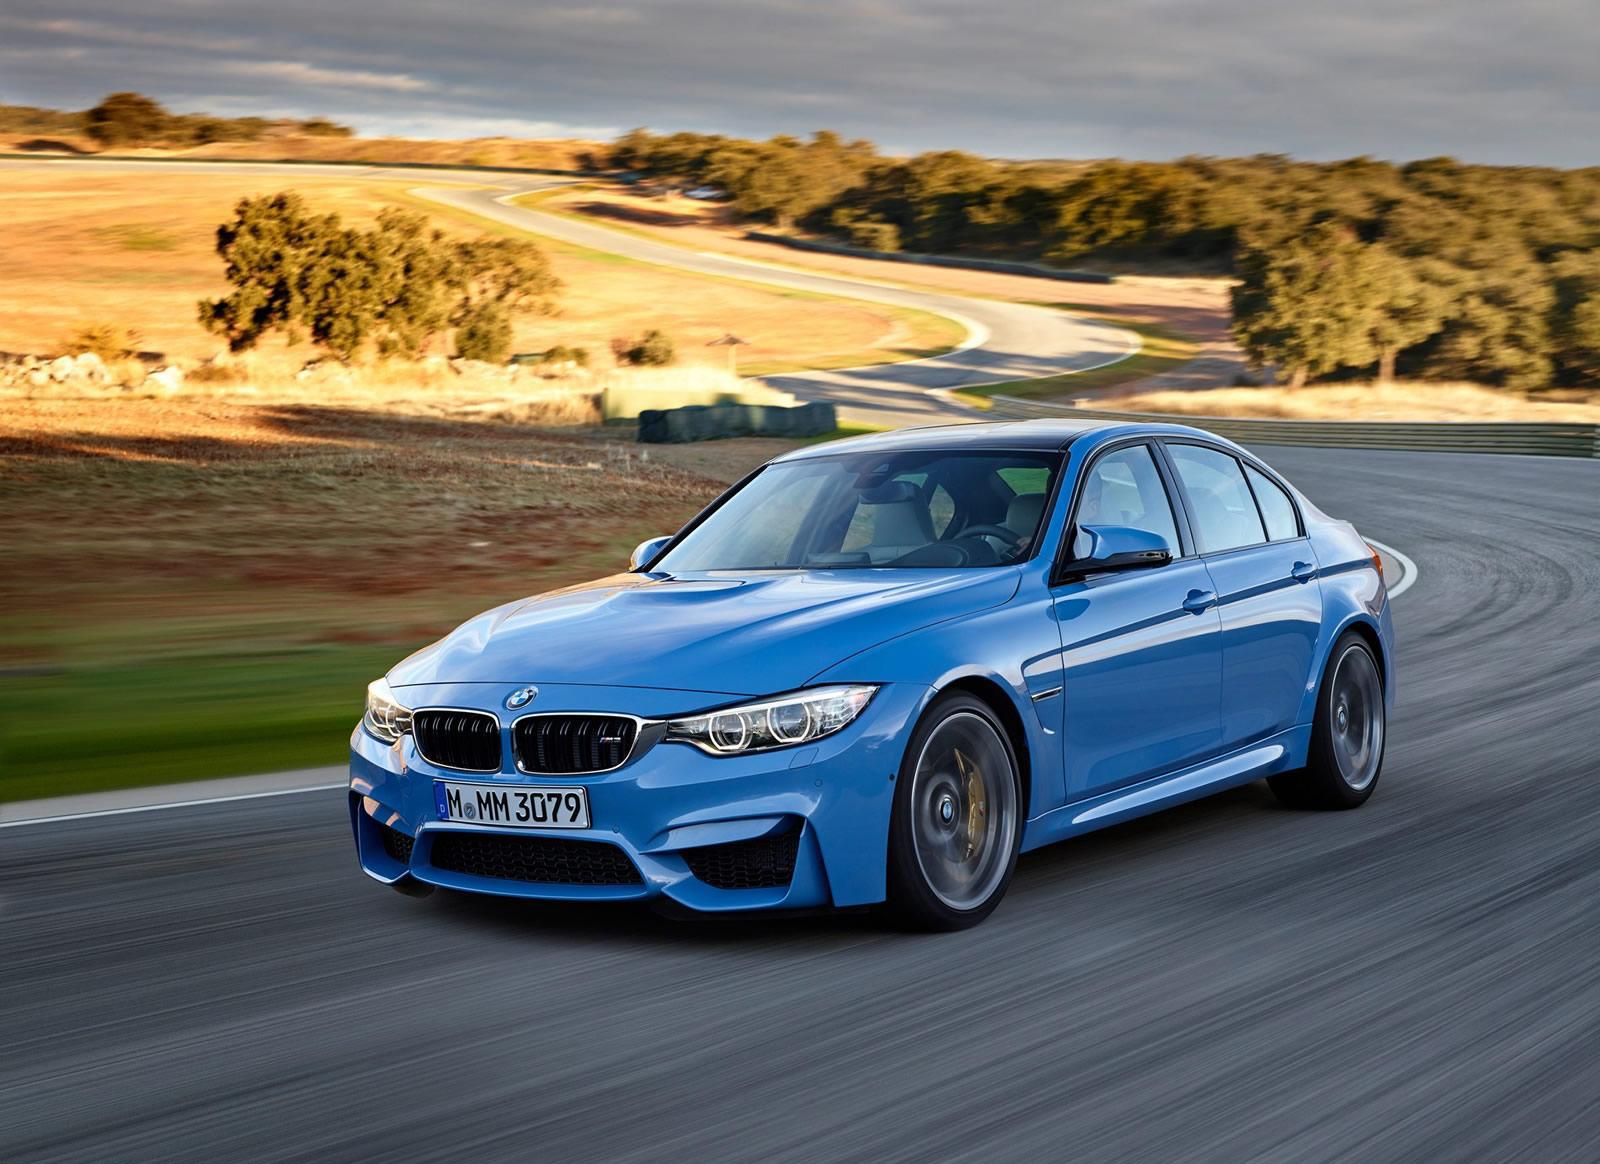 Foto de BMW M3 2014 (1/13)